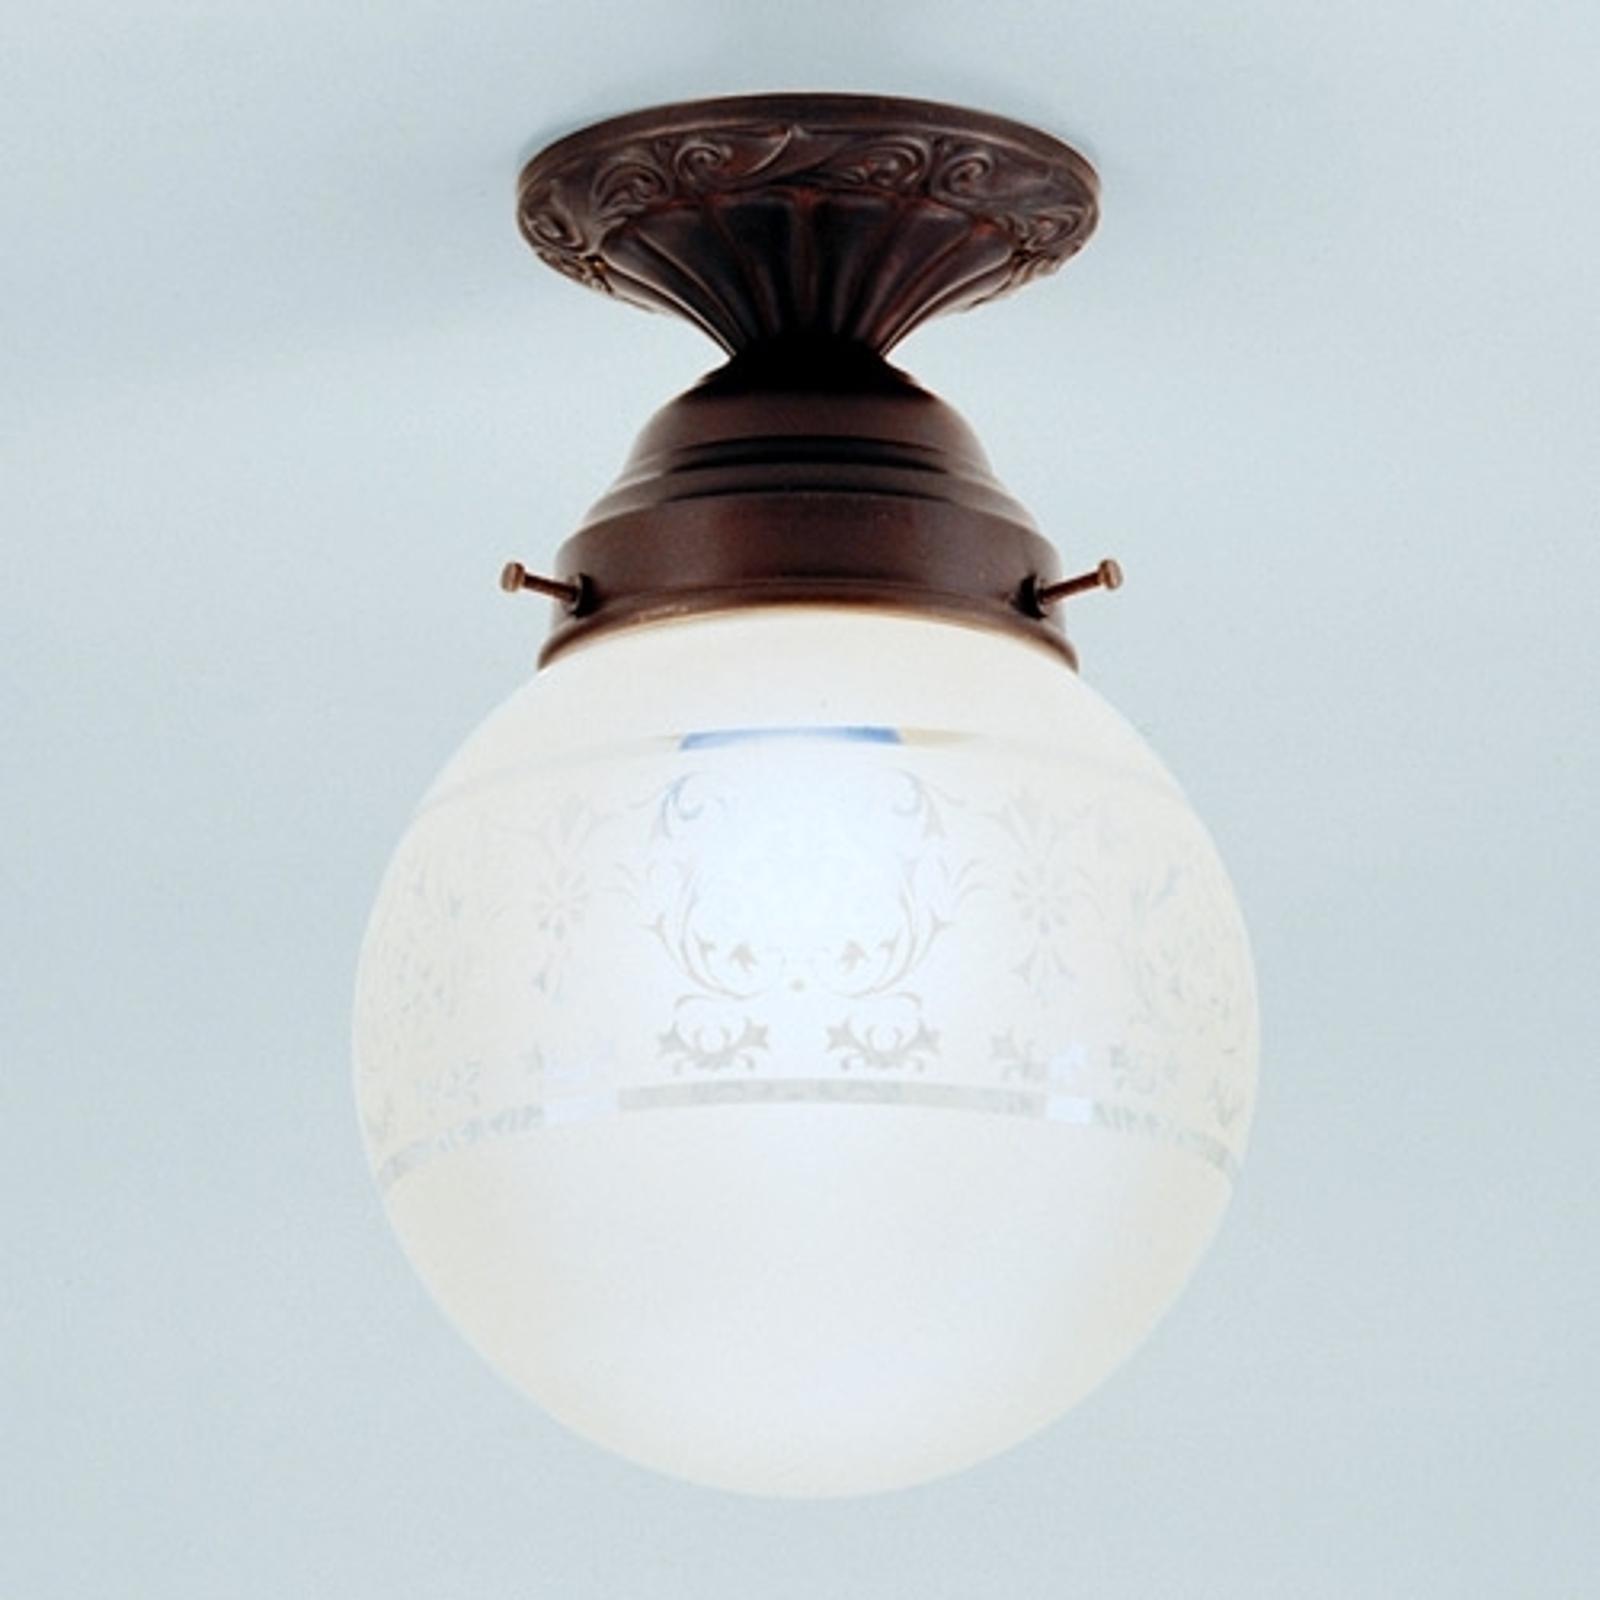 Jack - een plafondlamp made in Germany